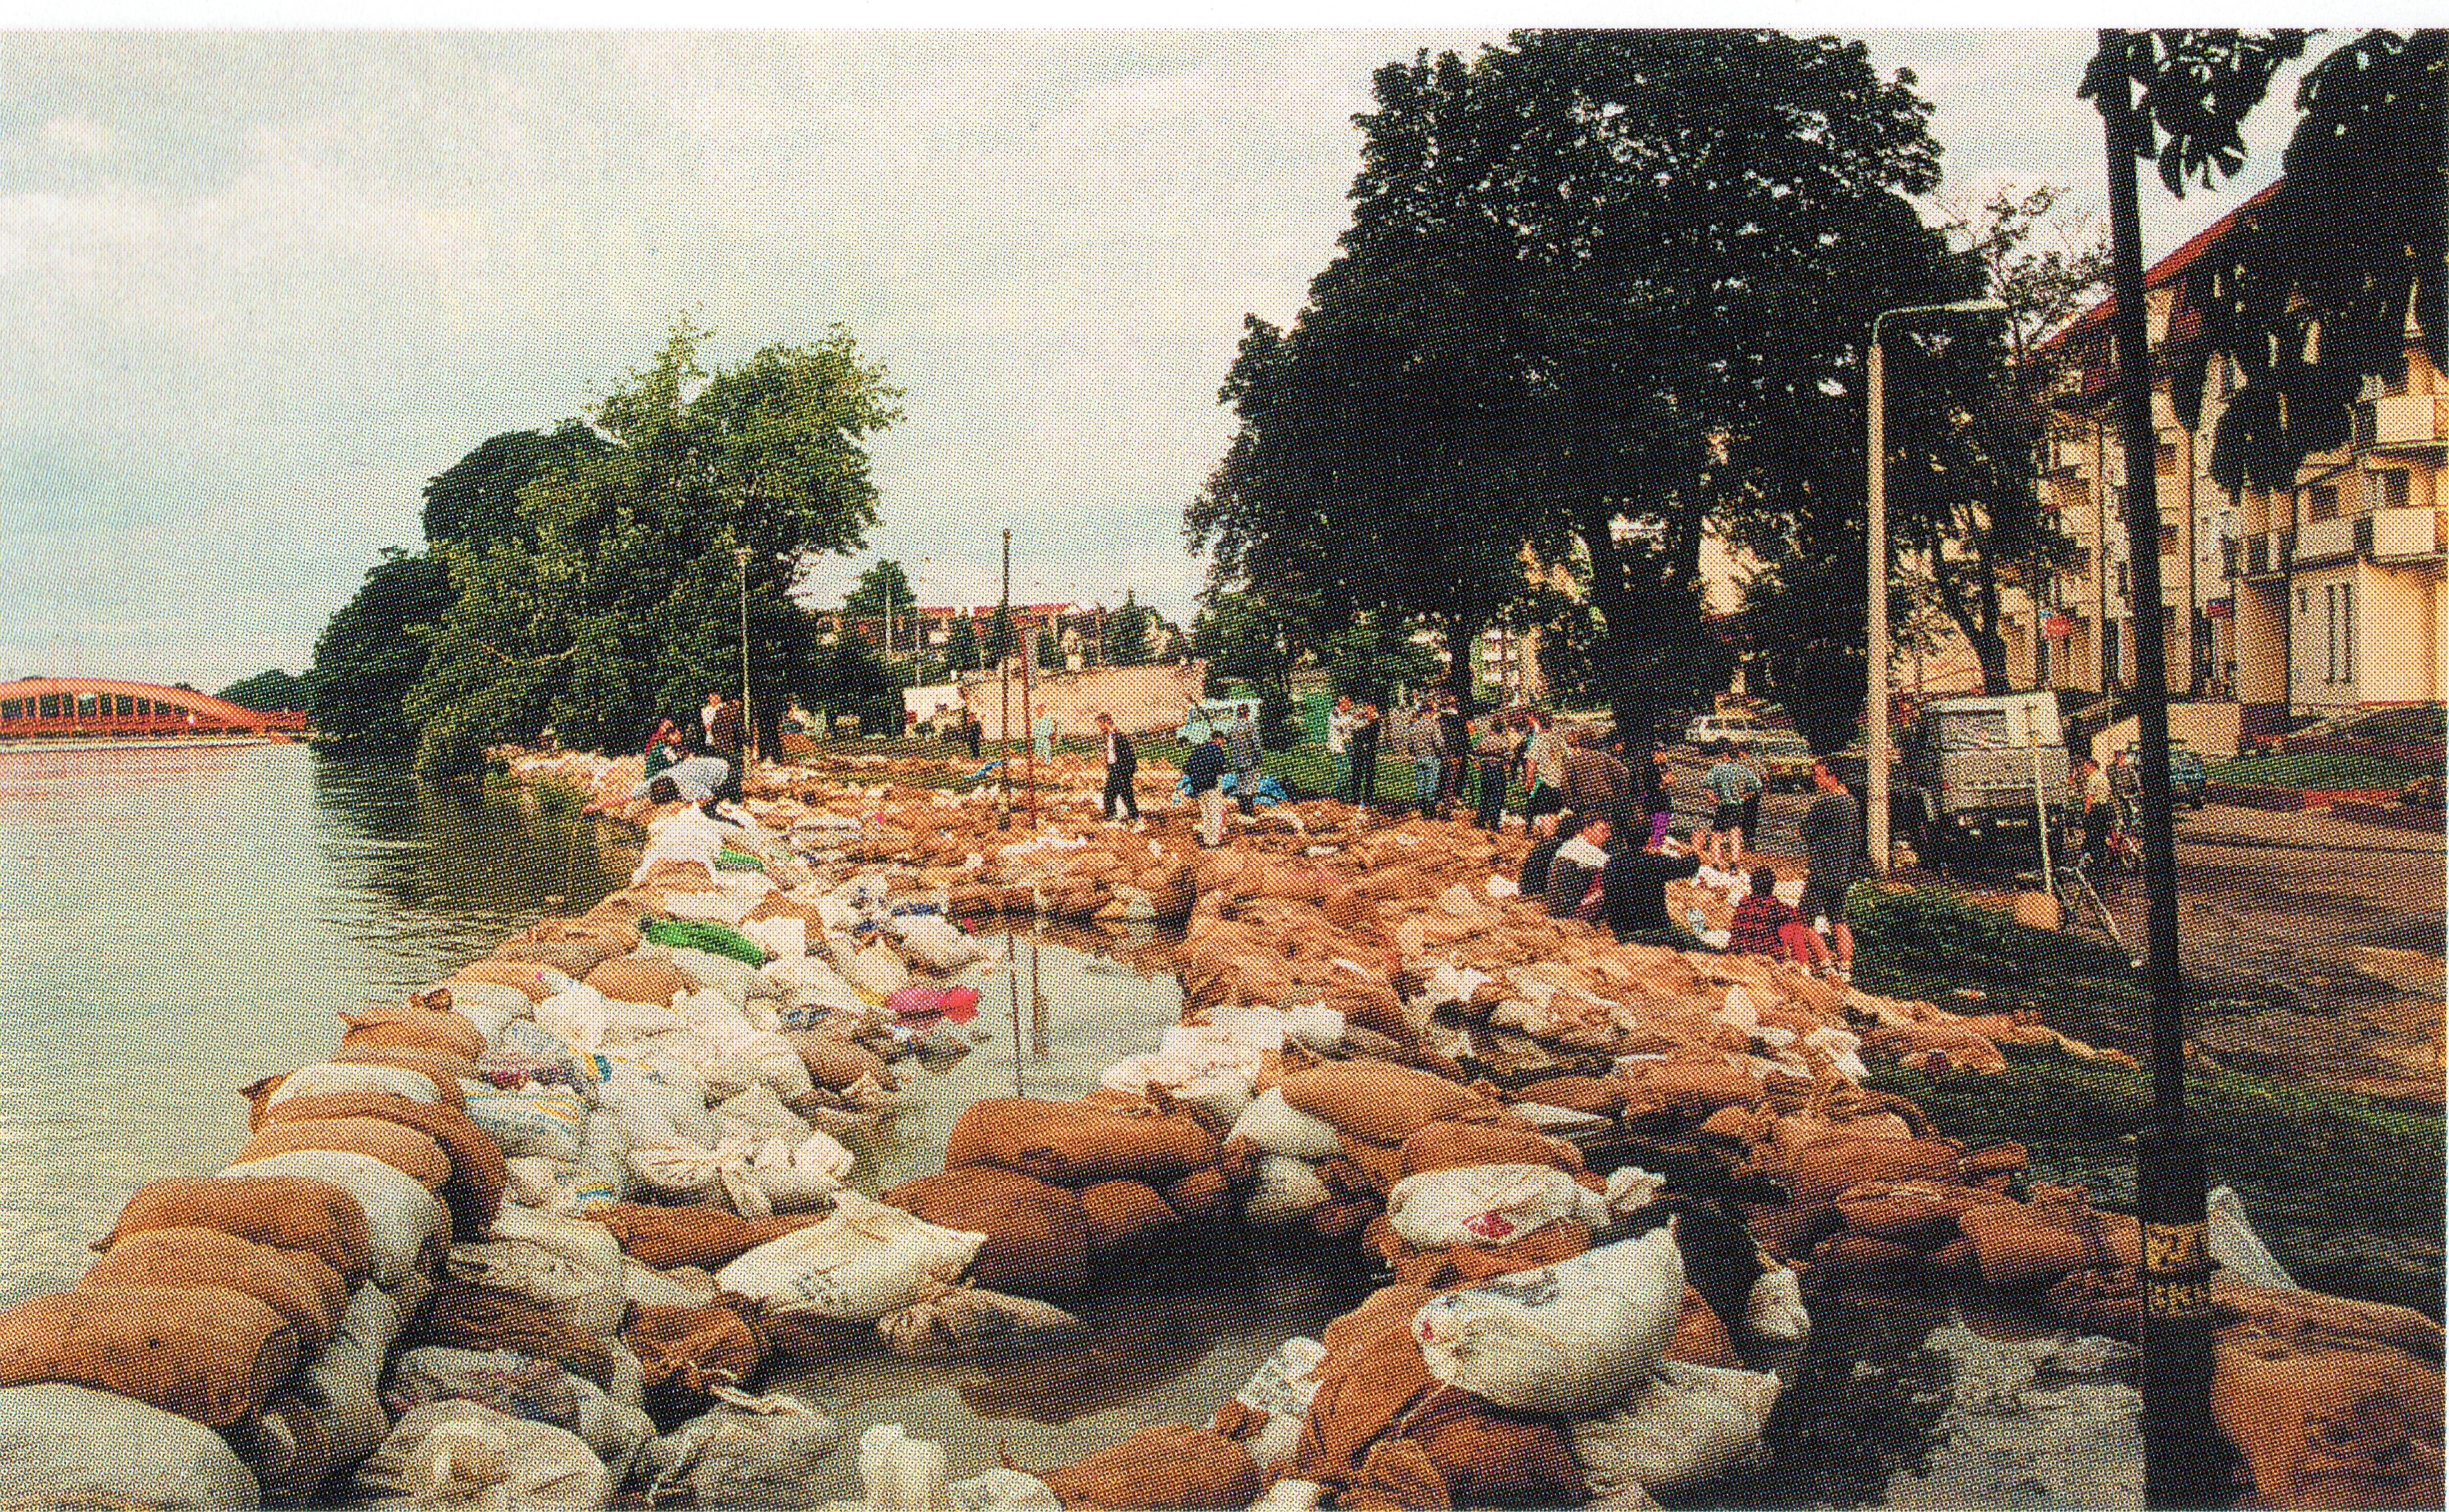 powódź karłowice 1997 nr005